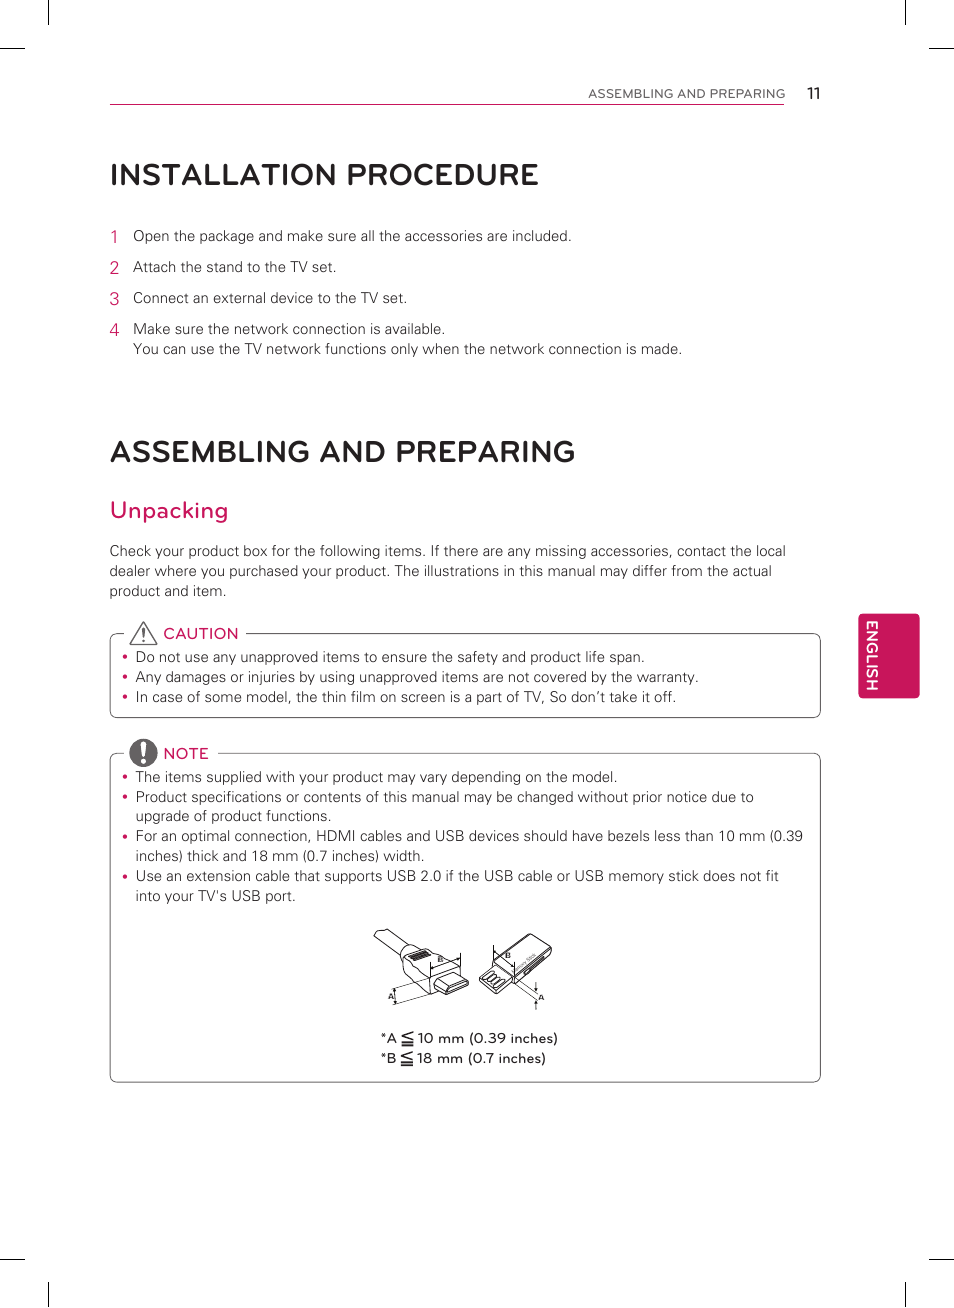 Installation procedure, Assembling and preparing, Unpacking | LG